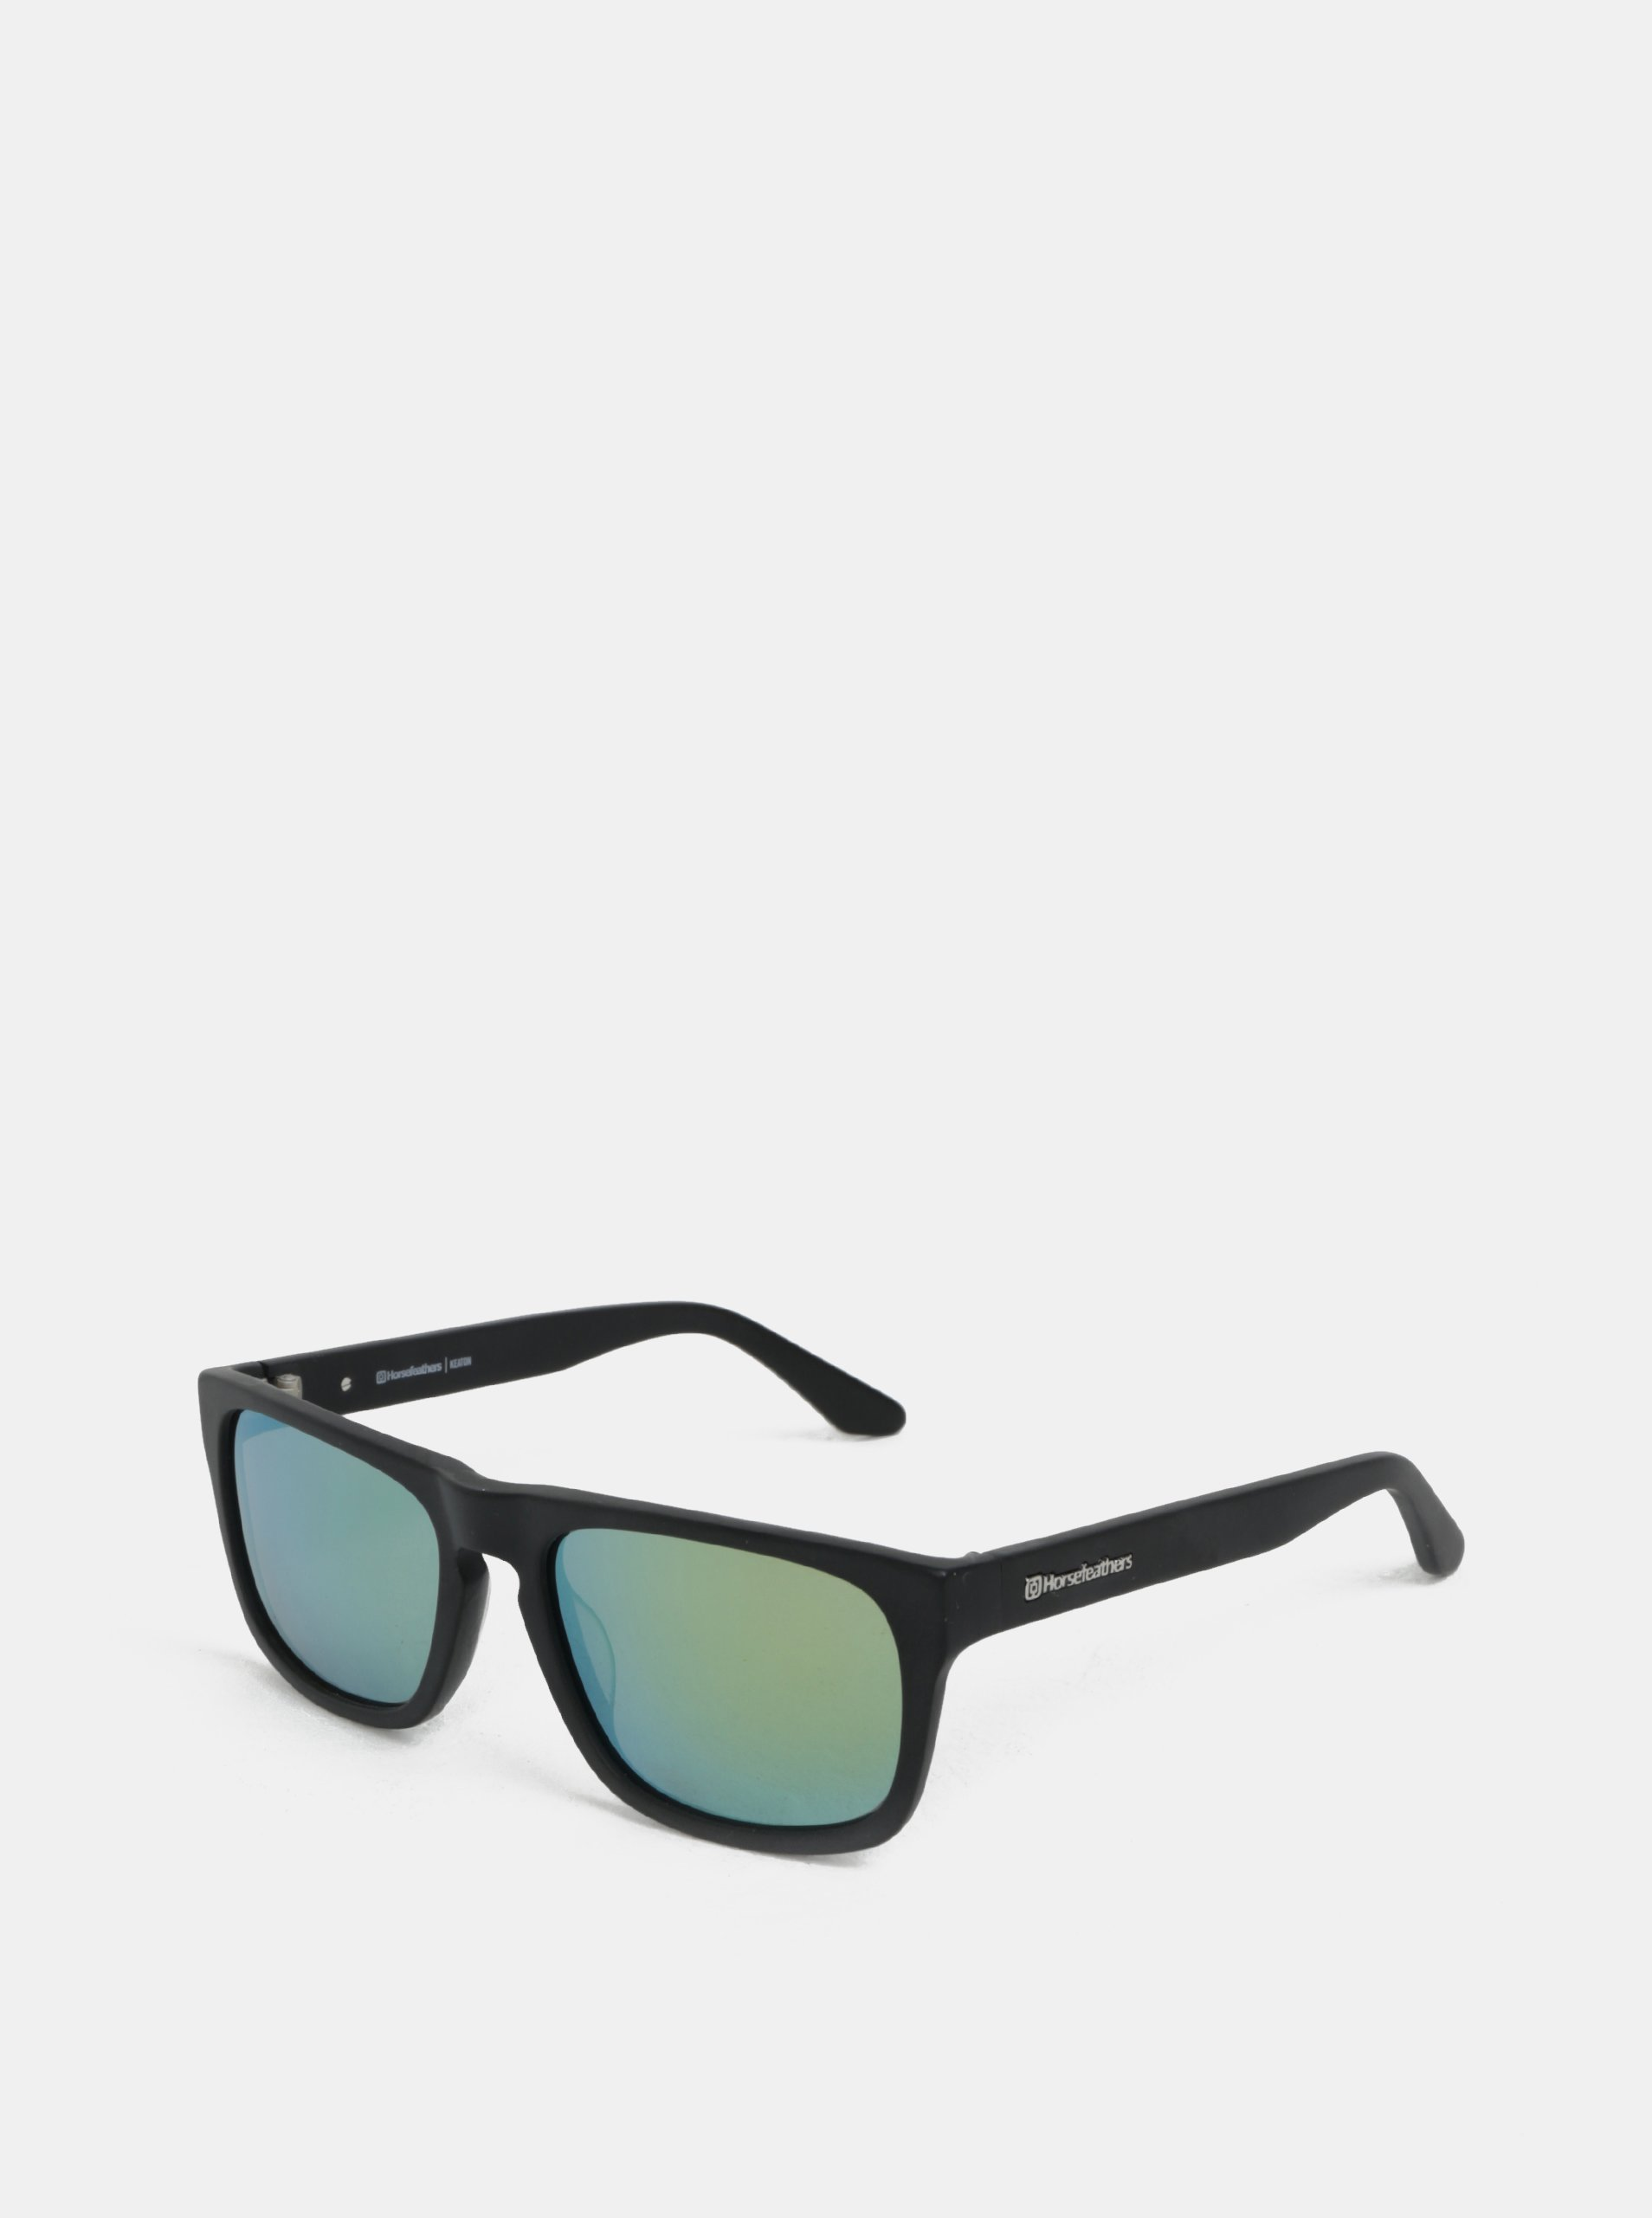 Zeleno-čierne pánske slnečné okuliare Horsefeathers Keaton  3fe201e3710